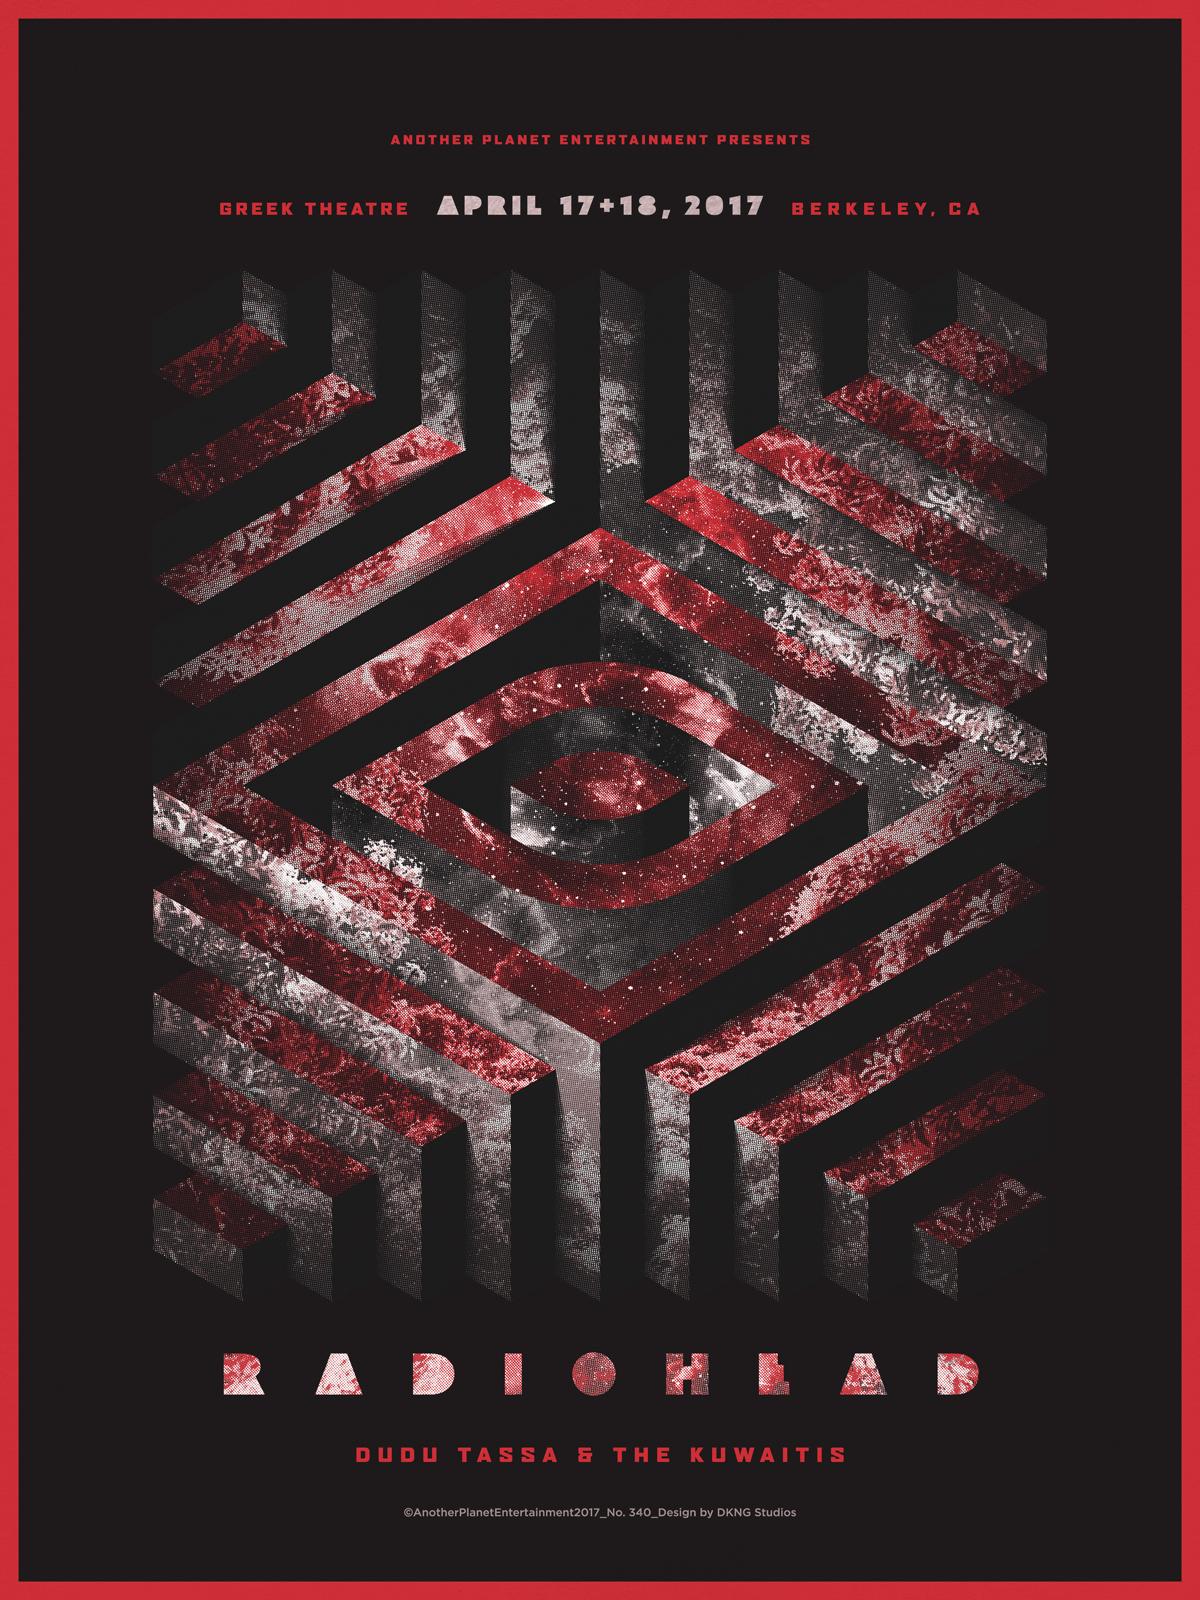 radiohead_red.jpg